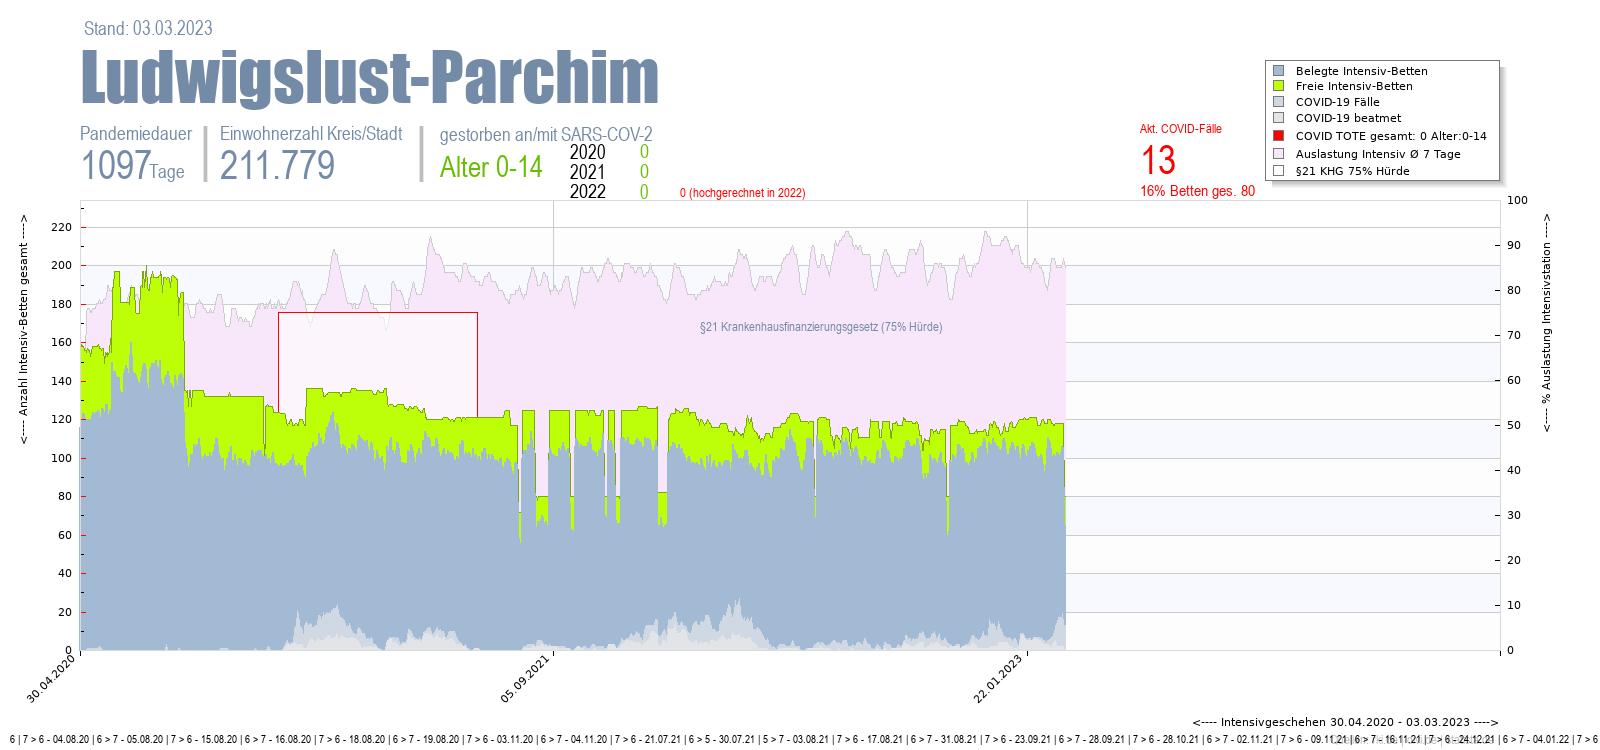 Intensivstation Auslastung Ludwigslust-Parchim Alter 0-4